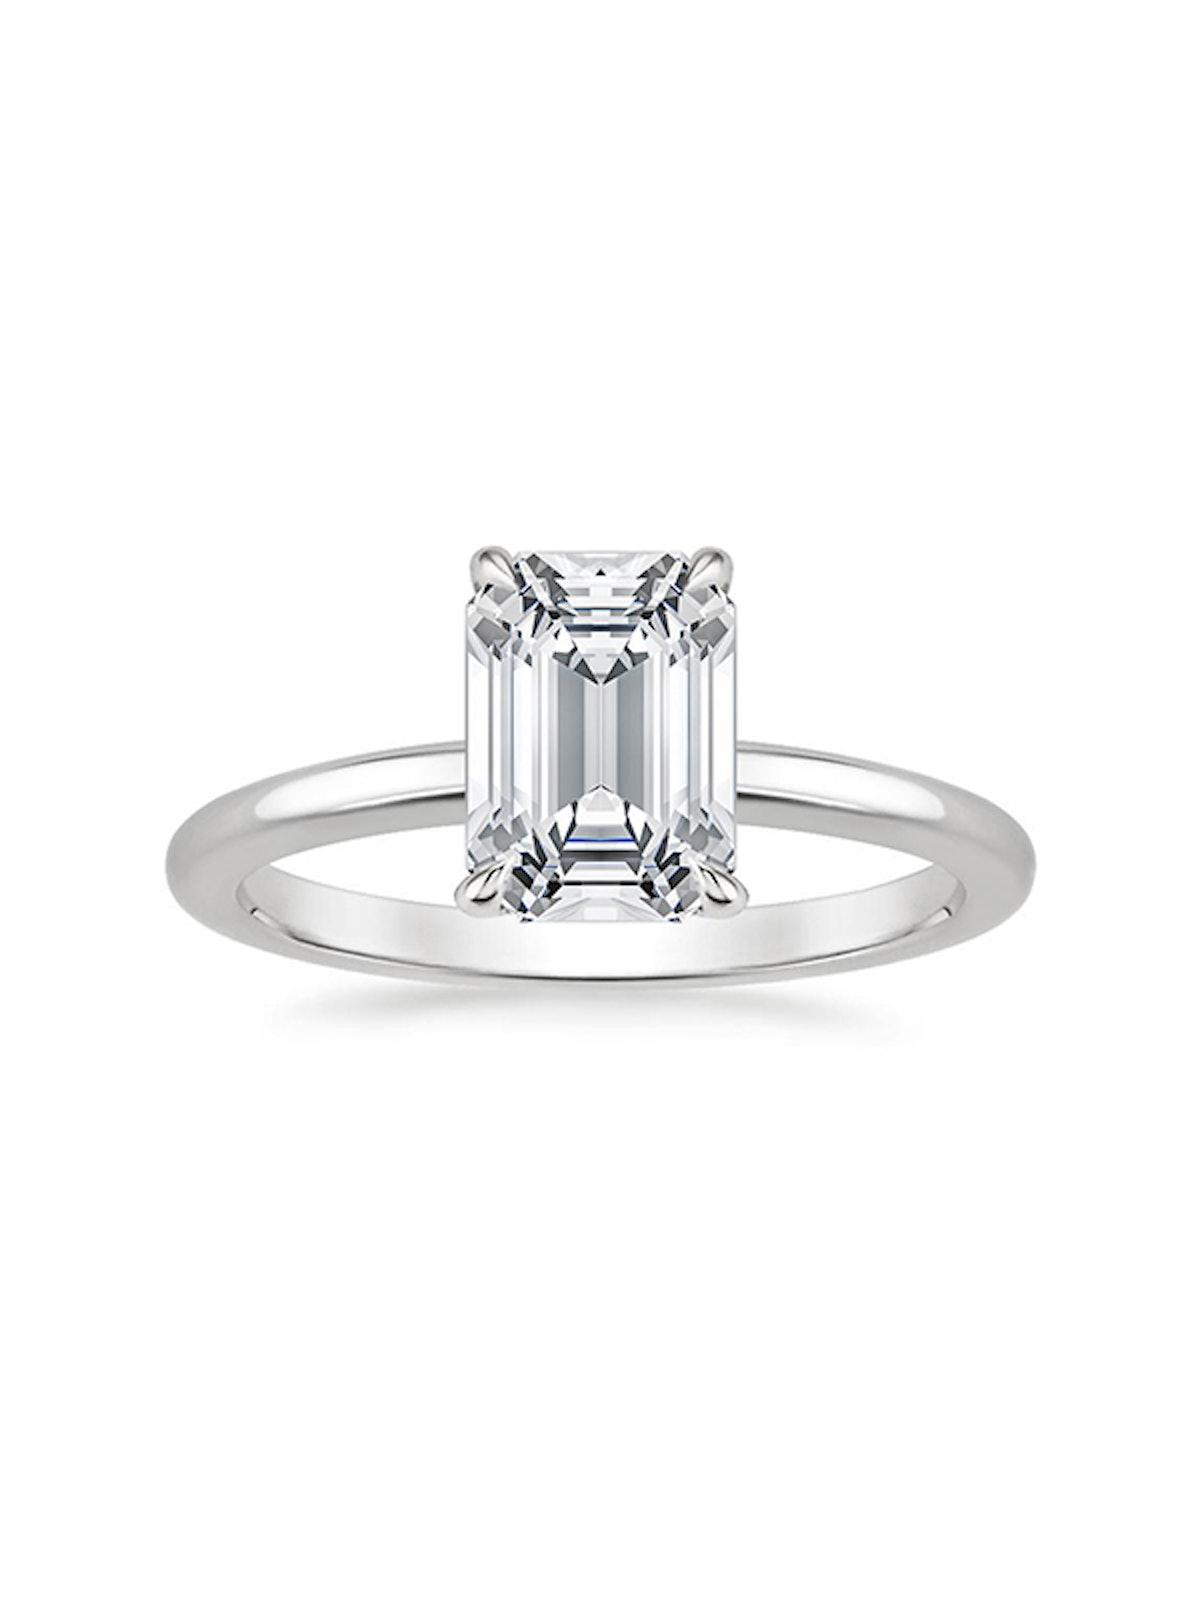 Elodie Ring